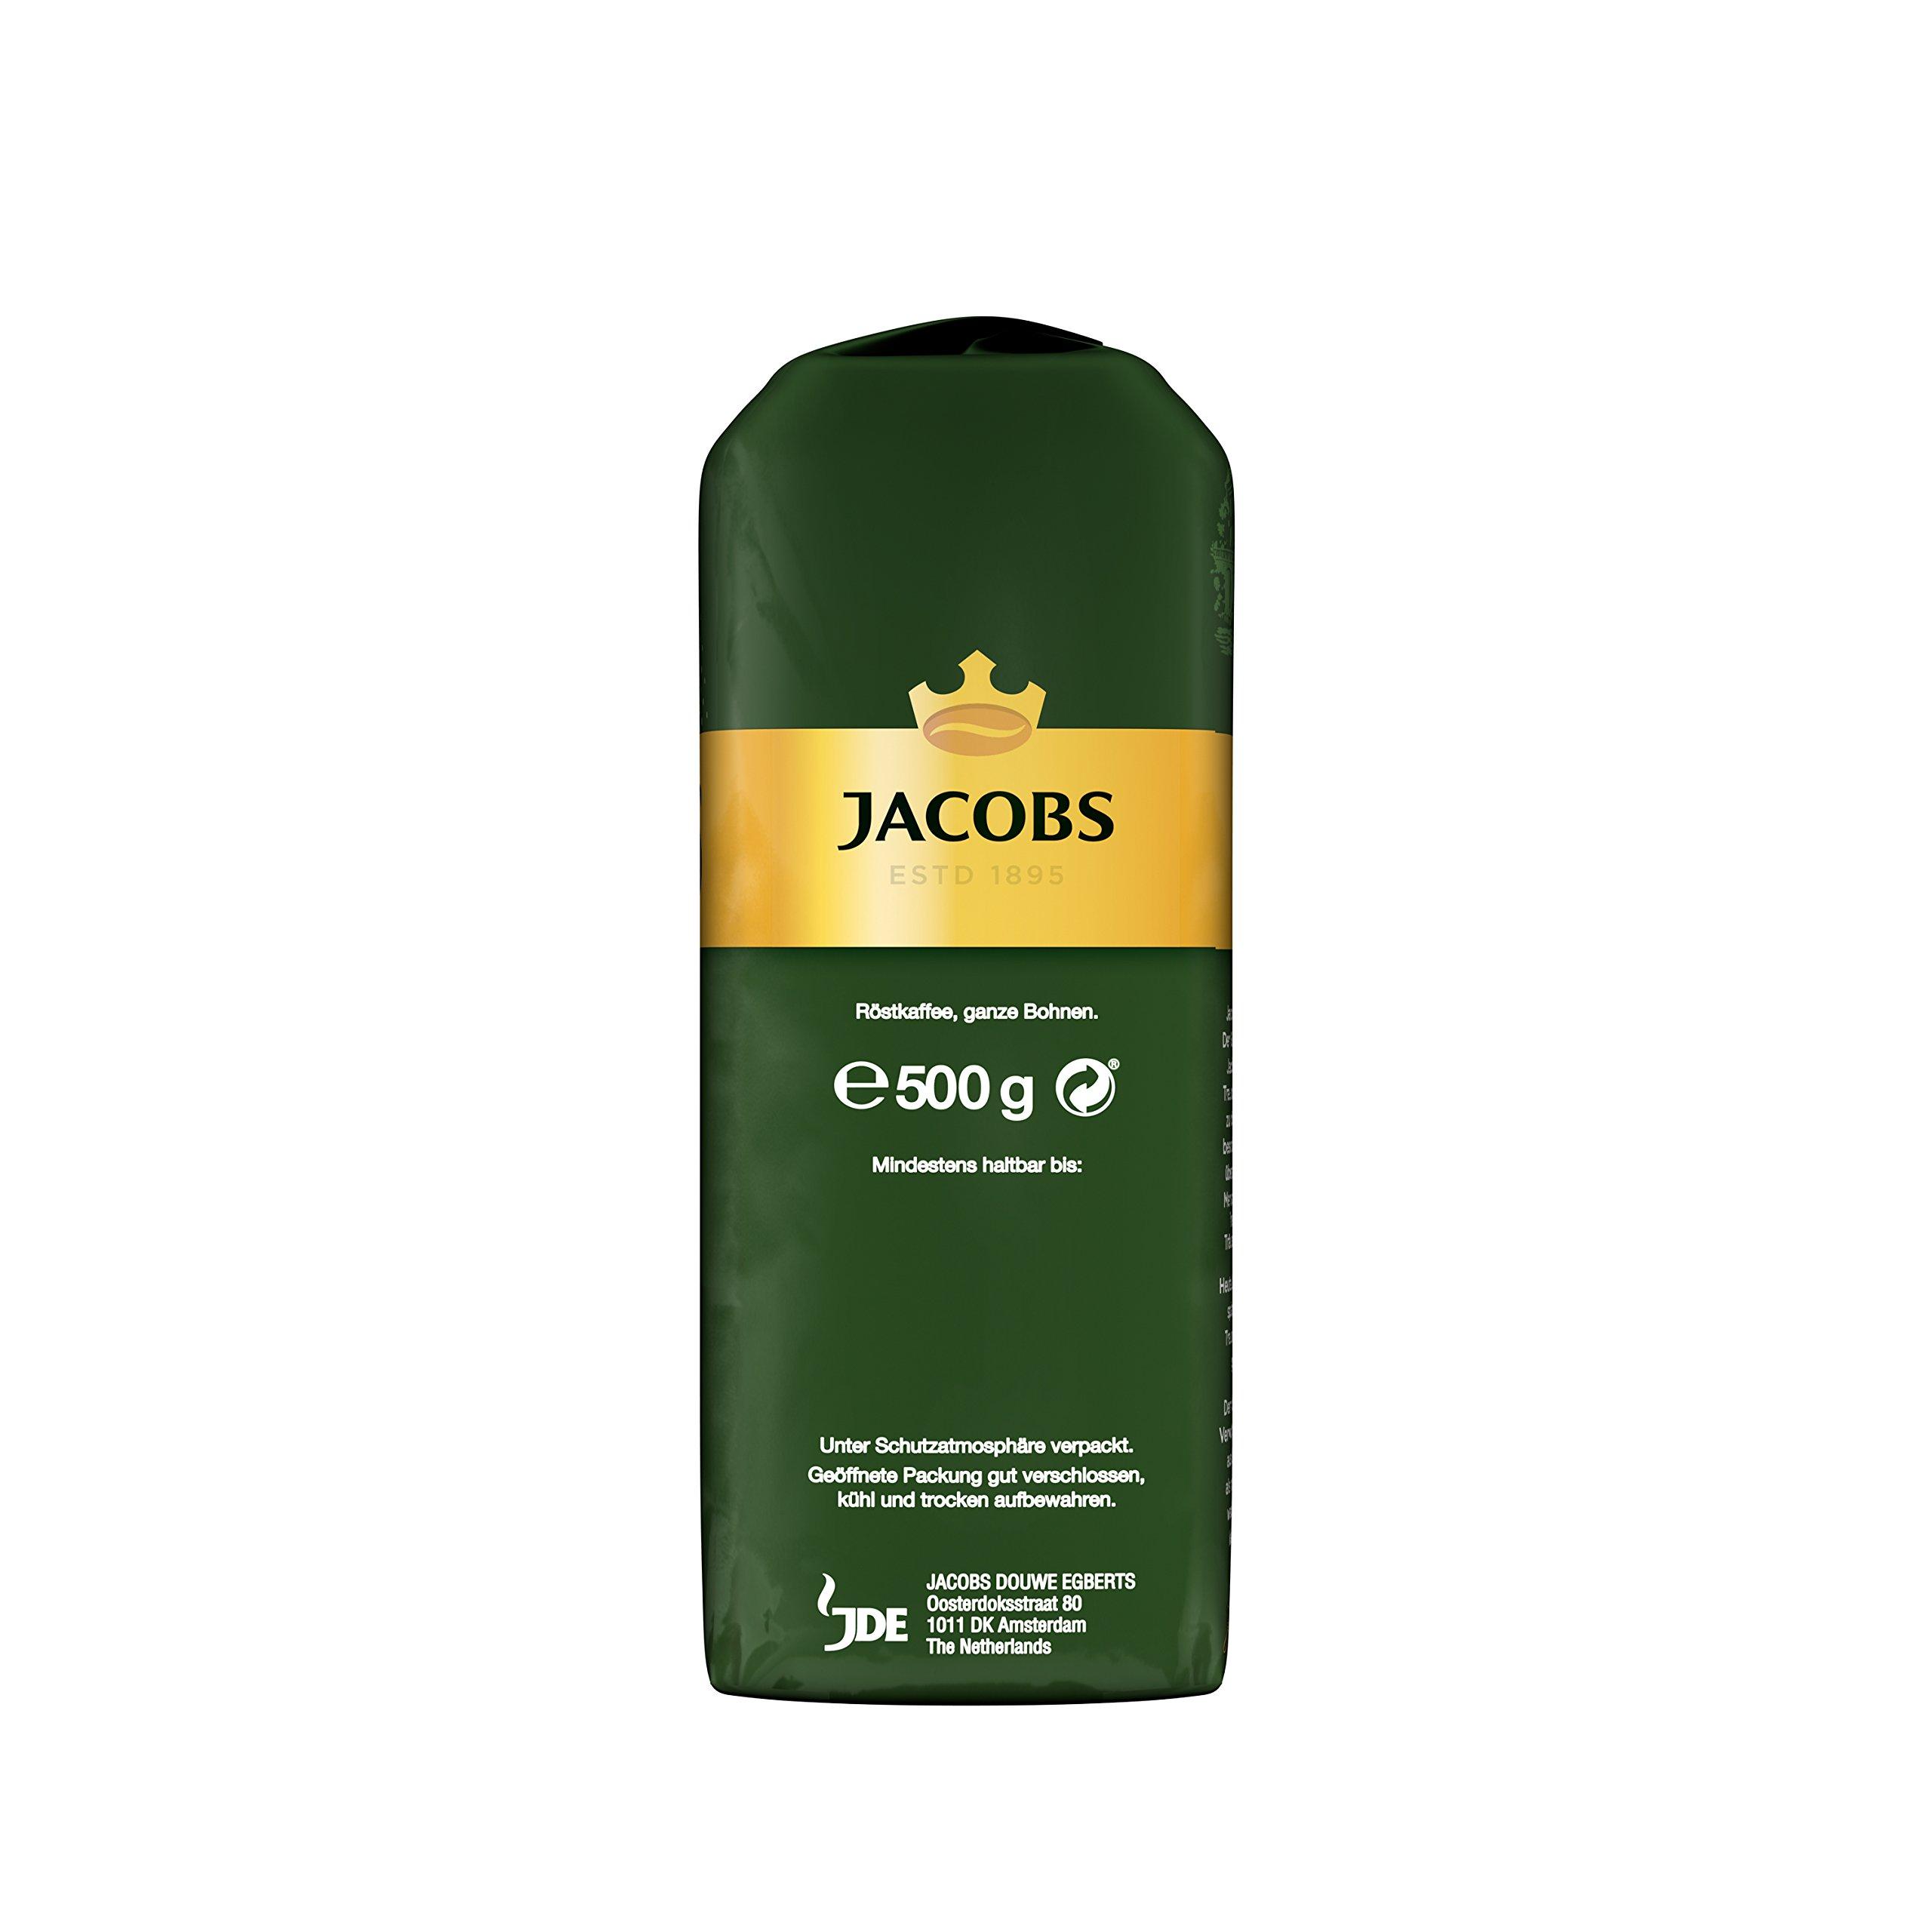 JACOBS KRONUNG WHOLE BEAN AROMA BOHNEN COFFEE CASE 12 x 500g by JACOBS WHOLE BEAN COFFEE (Image #5)